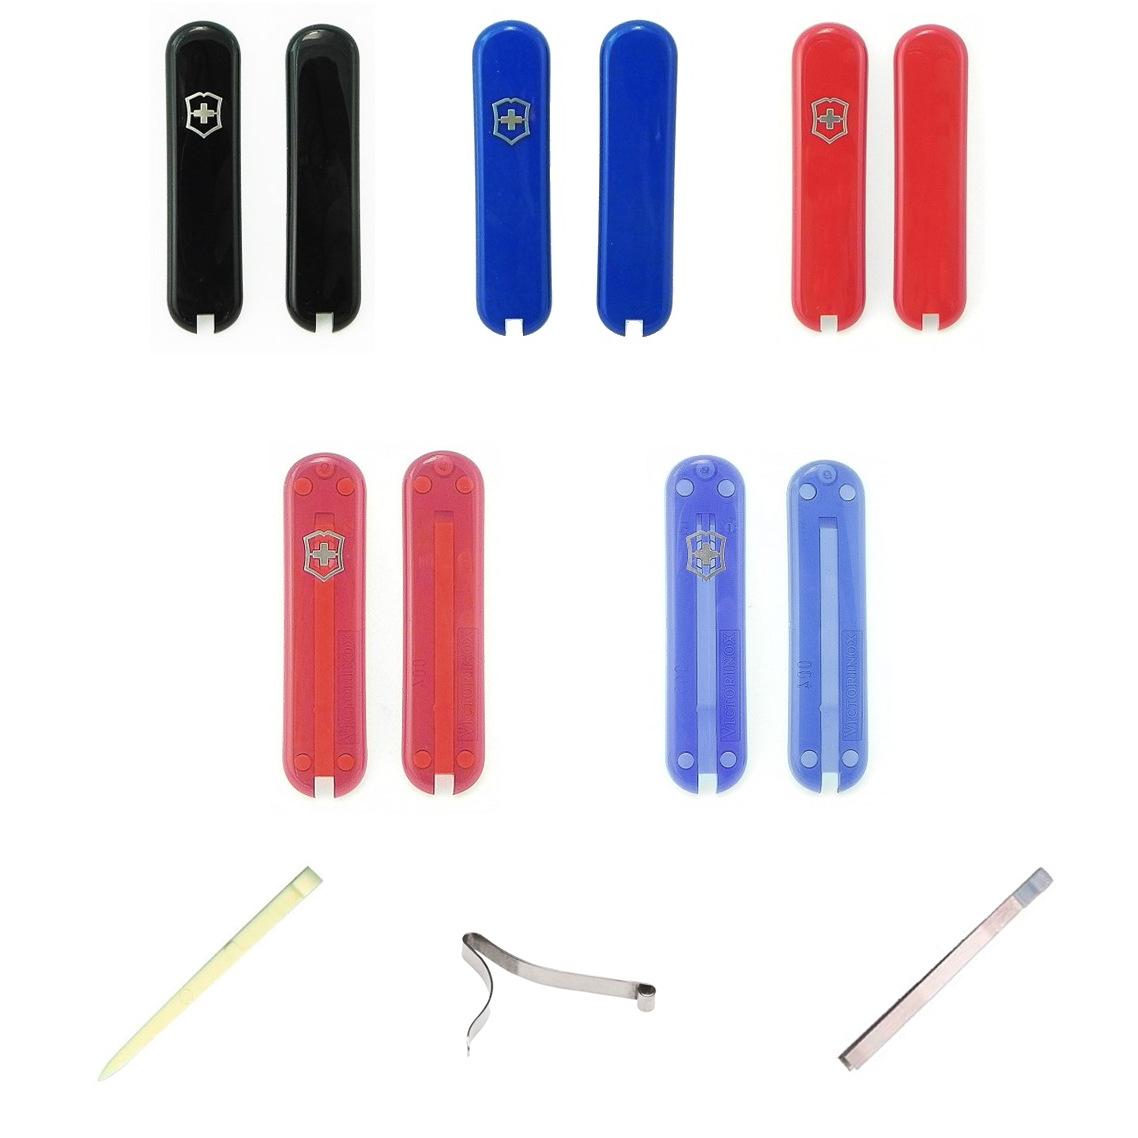 Victorinox 58mm Swiss Army Knife Spares Tweezers Toothpick